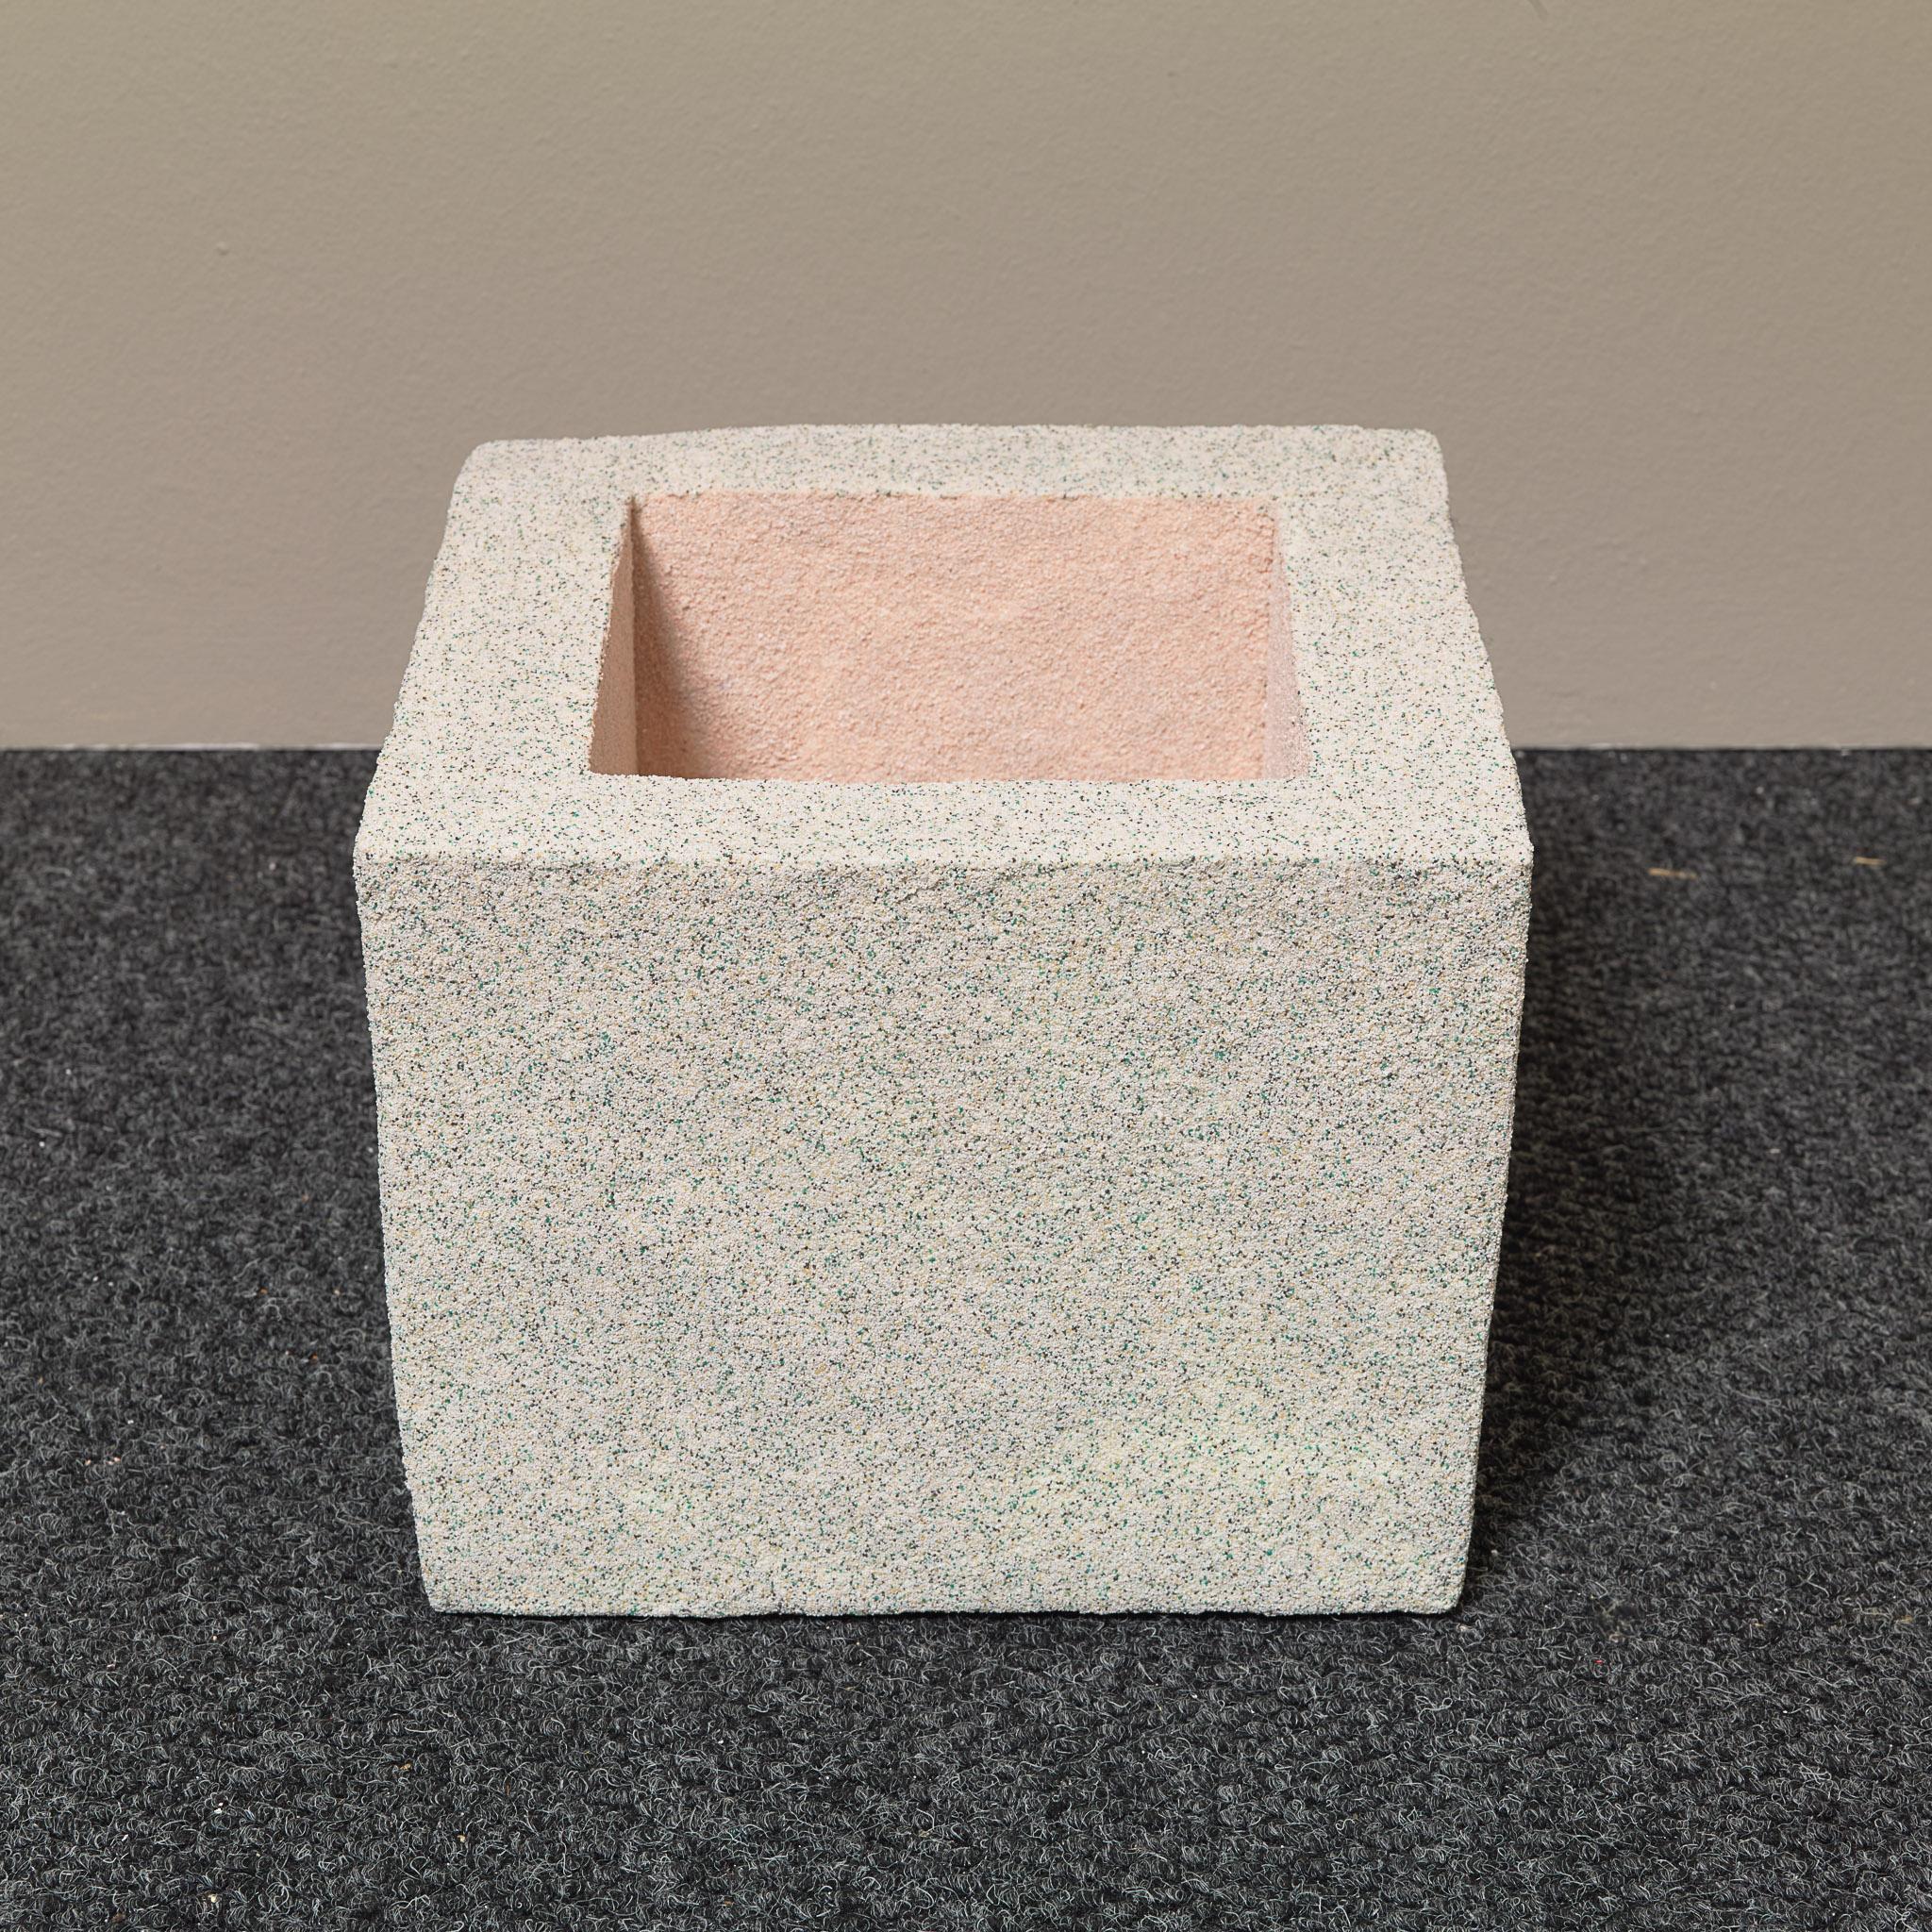 Rachel Higgins,   Soap Box   , 2015 ,  Polystyrene, fiberglass, cement, cerastone  , 12 1/4 x 11 3/4 x 9 18 in.